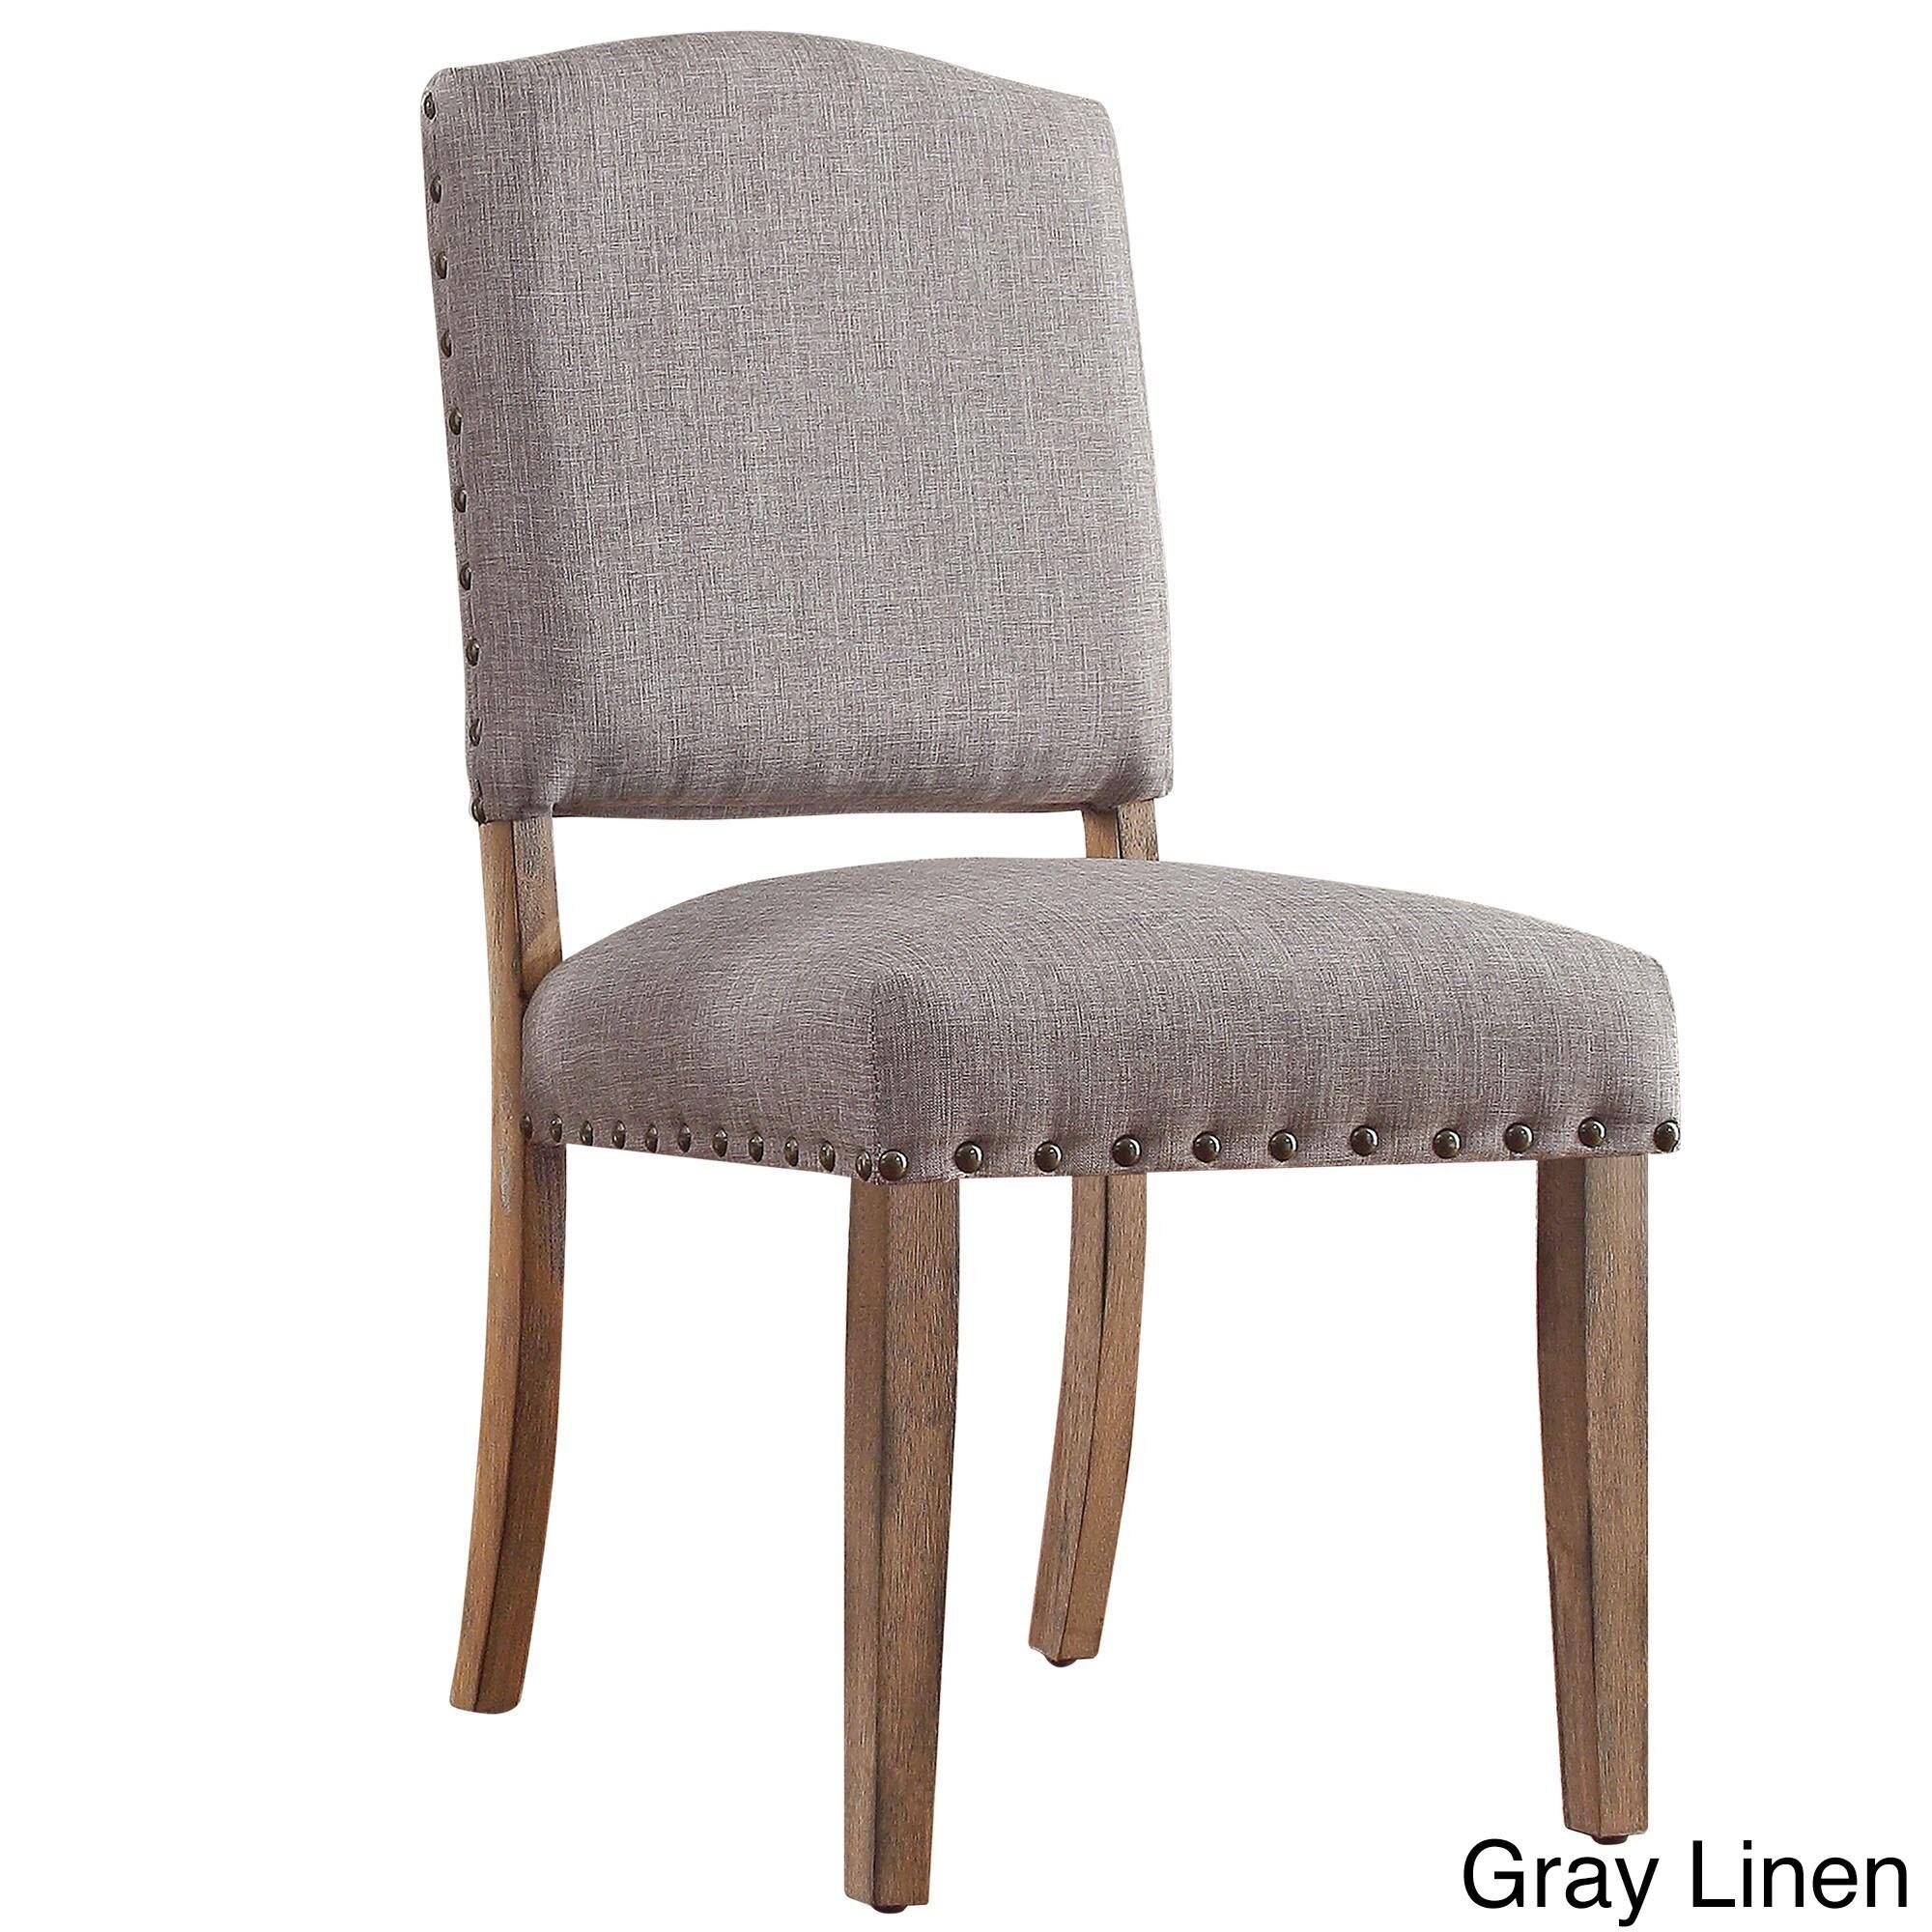 Benchwright Premium Nailhead Upholstered Dining Chairs (S...